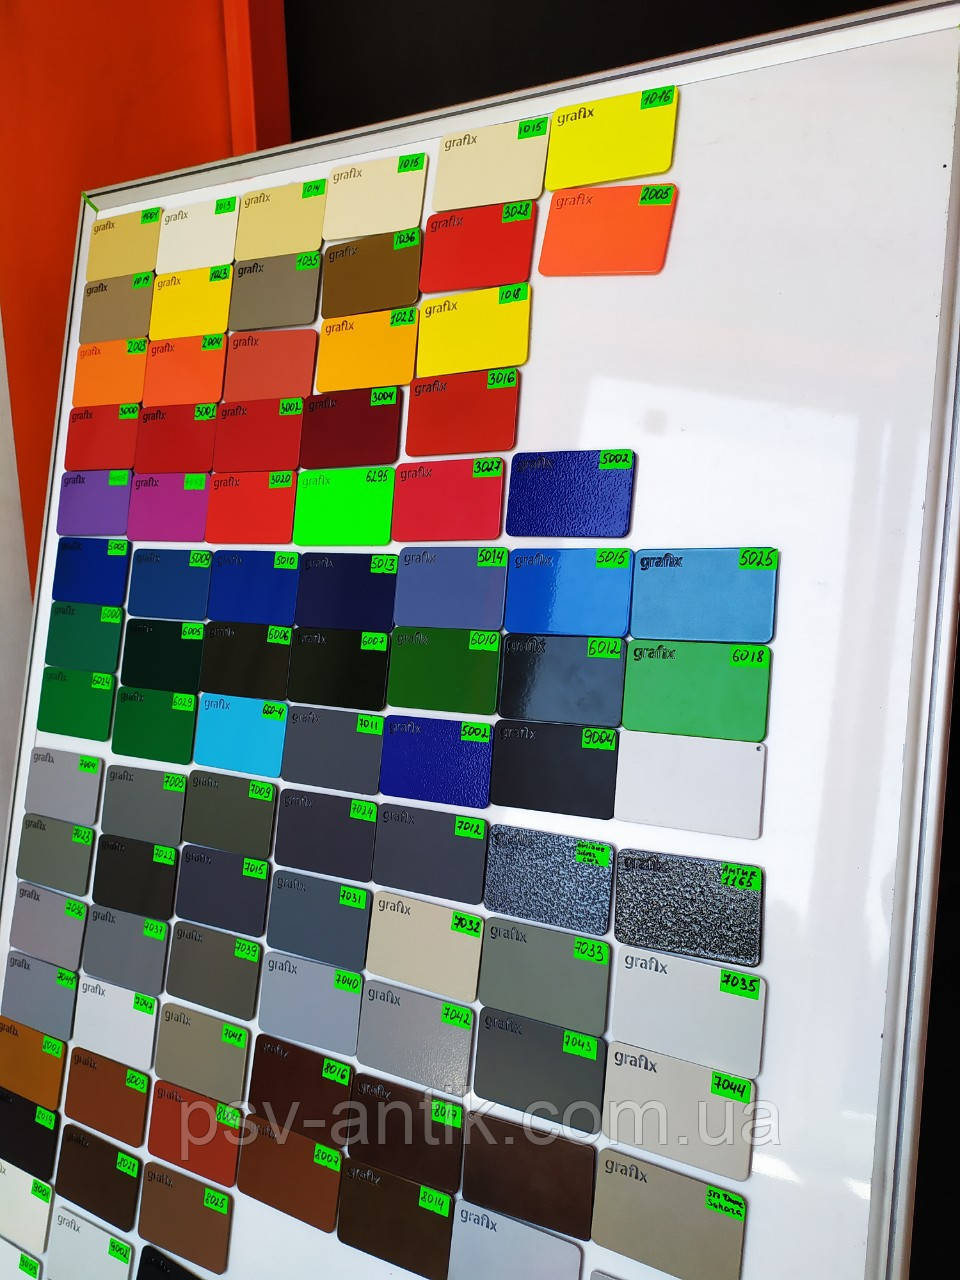 Порошковая краска глянцевая, полиэфирная, архитектурная, 9001